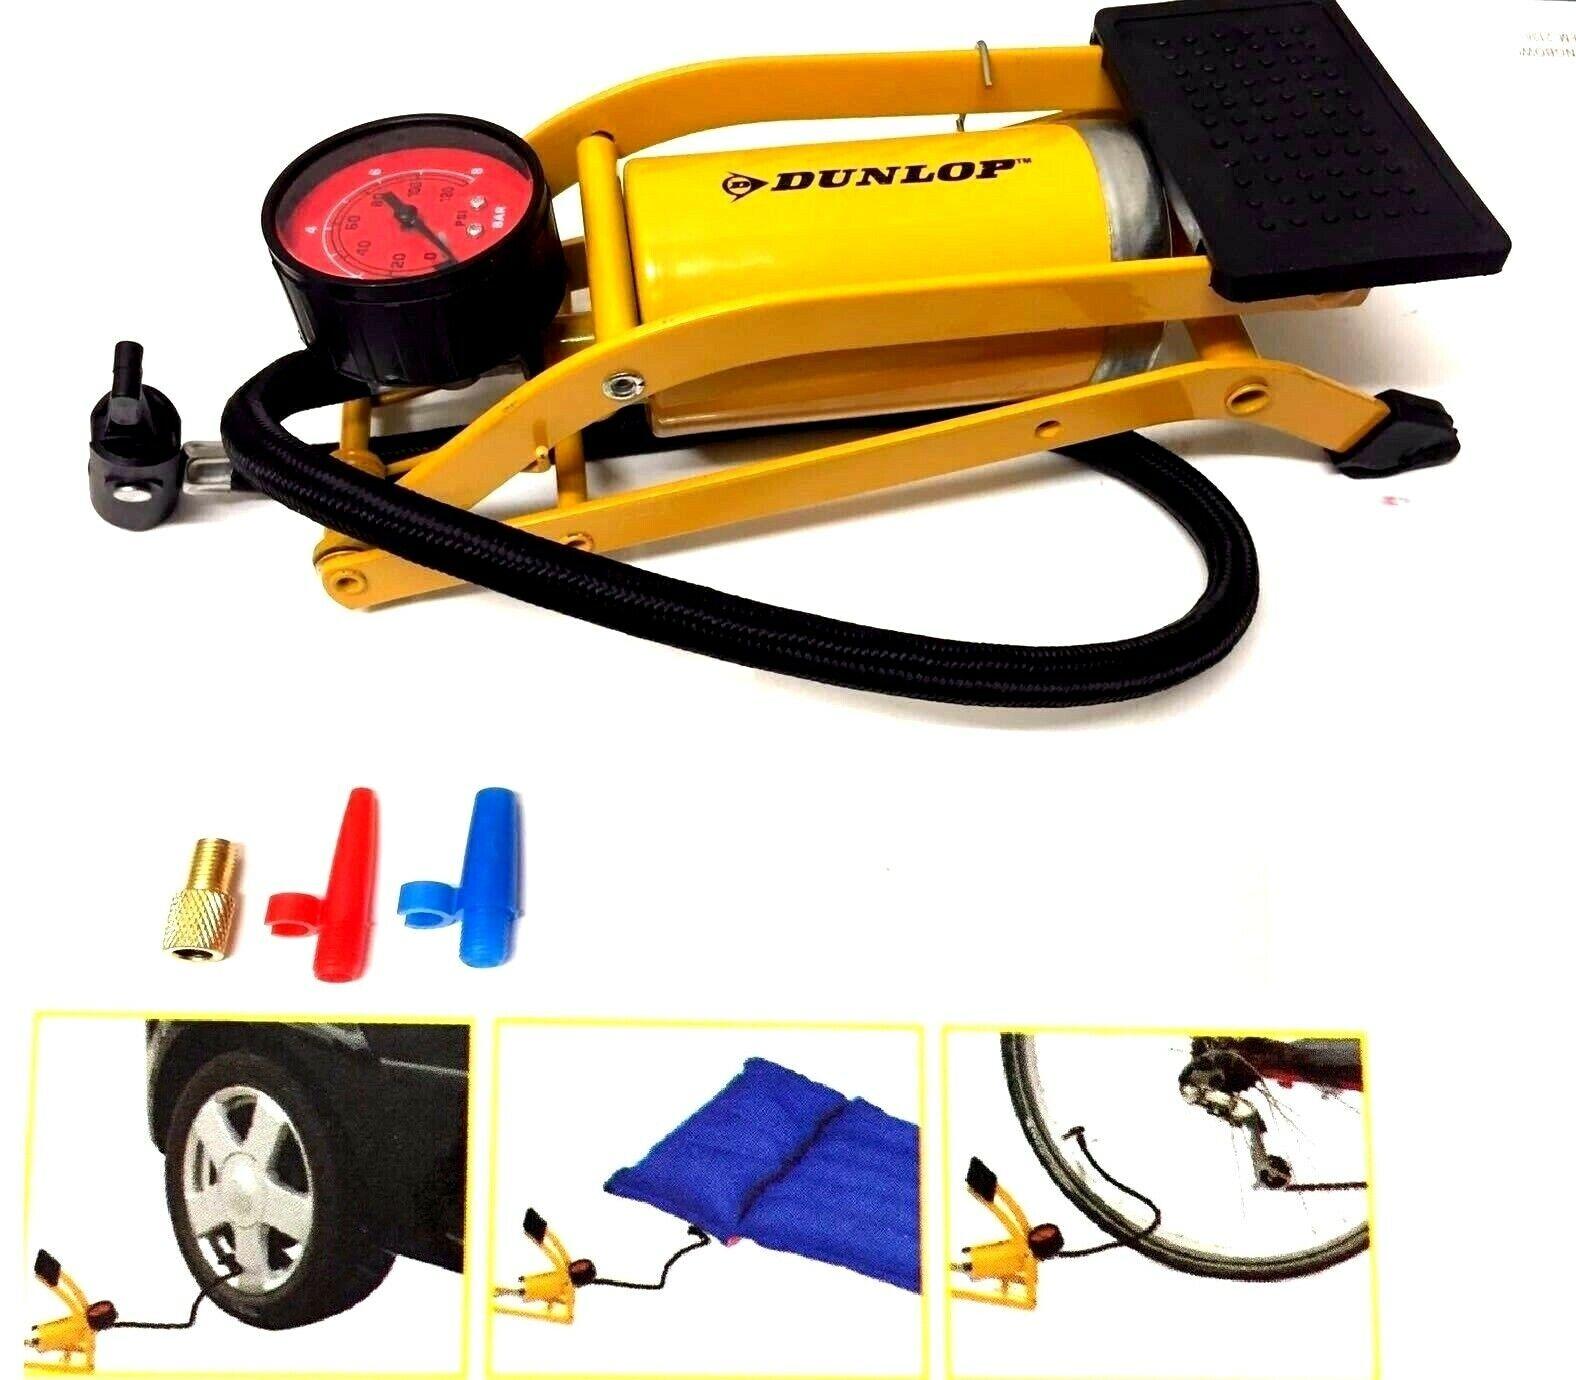 Fahrradpumpe Minipumpe MINI Luftpumpe Pumpe Ballpumpe Mit Manometer Kunststoff